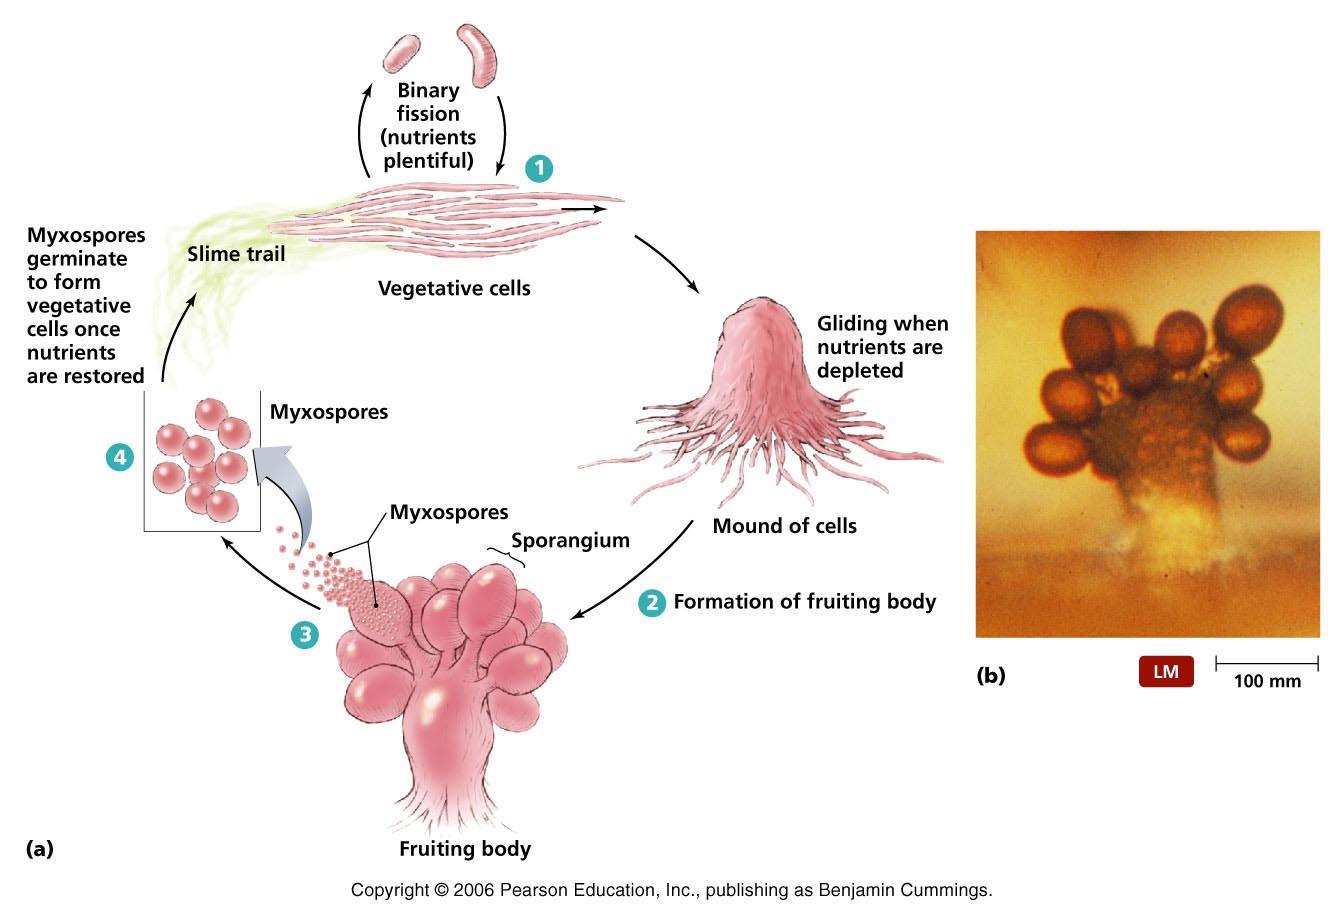 Life Cycle of Myxobacteria.1.jpg